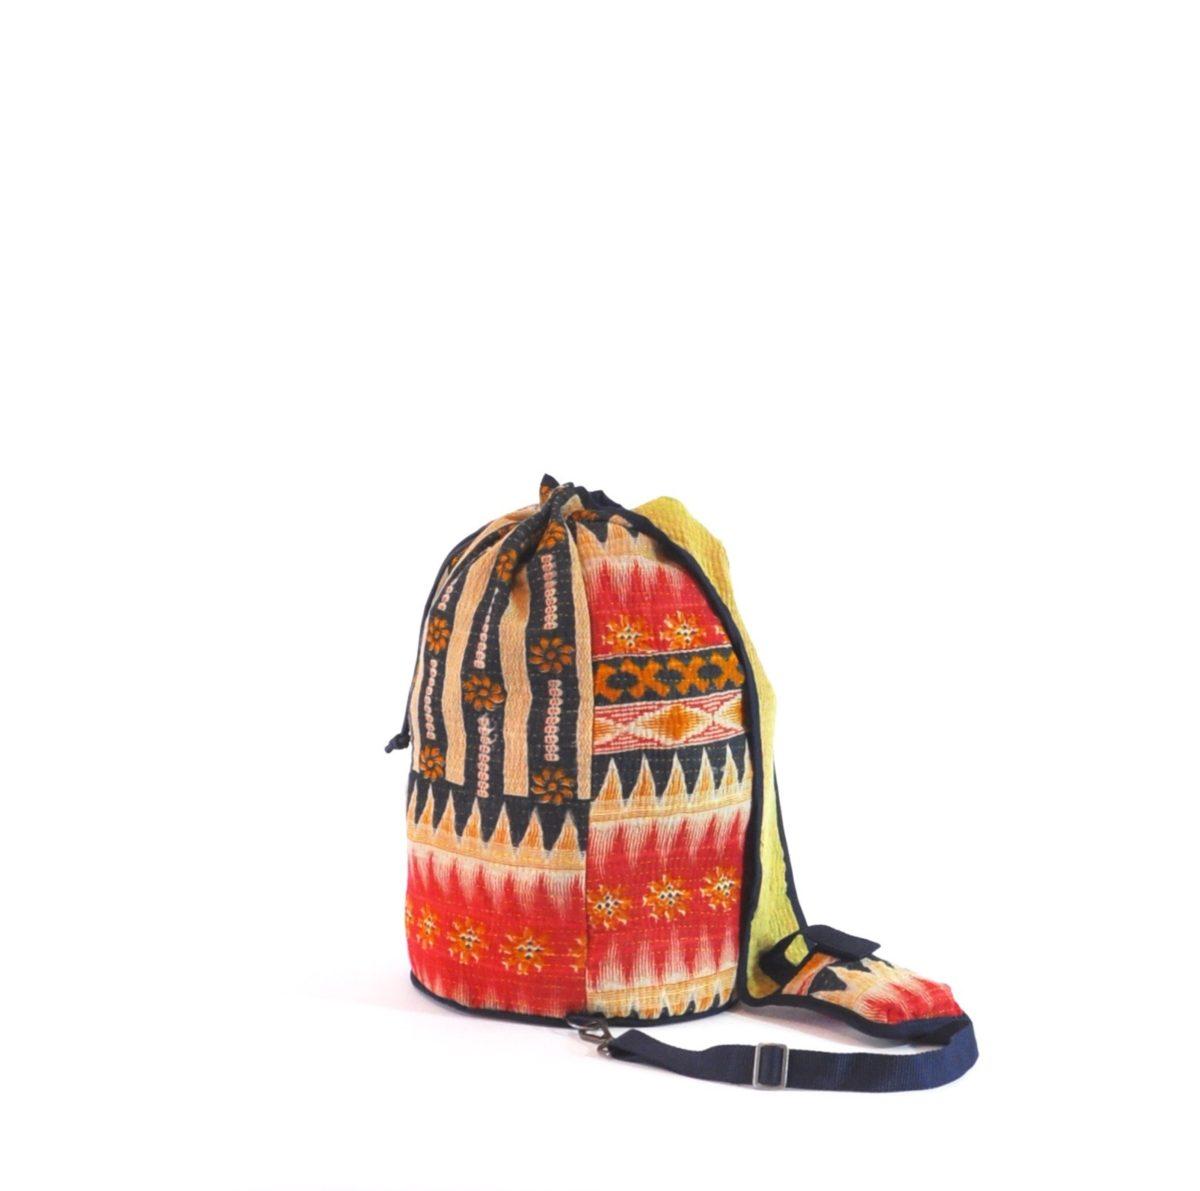 YESNESS Indigo & Cream Vertical Stripes w:Red Band 6